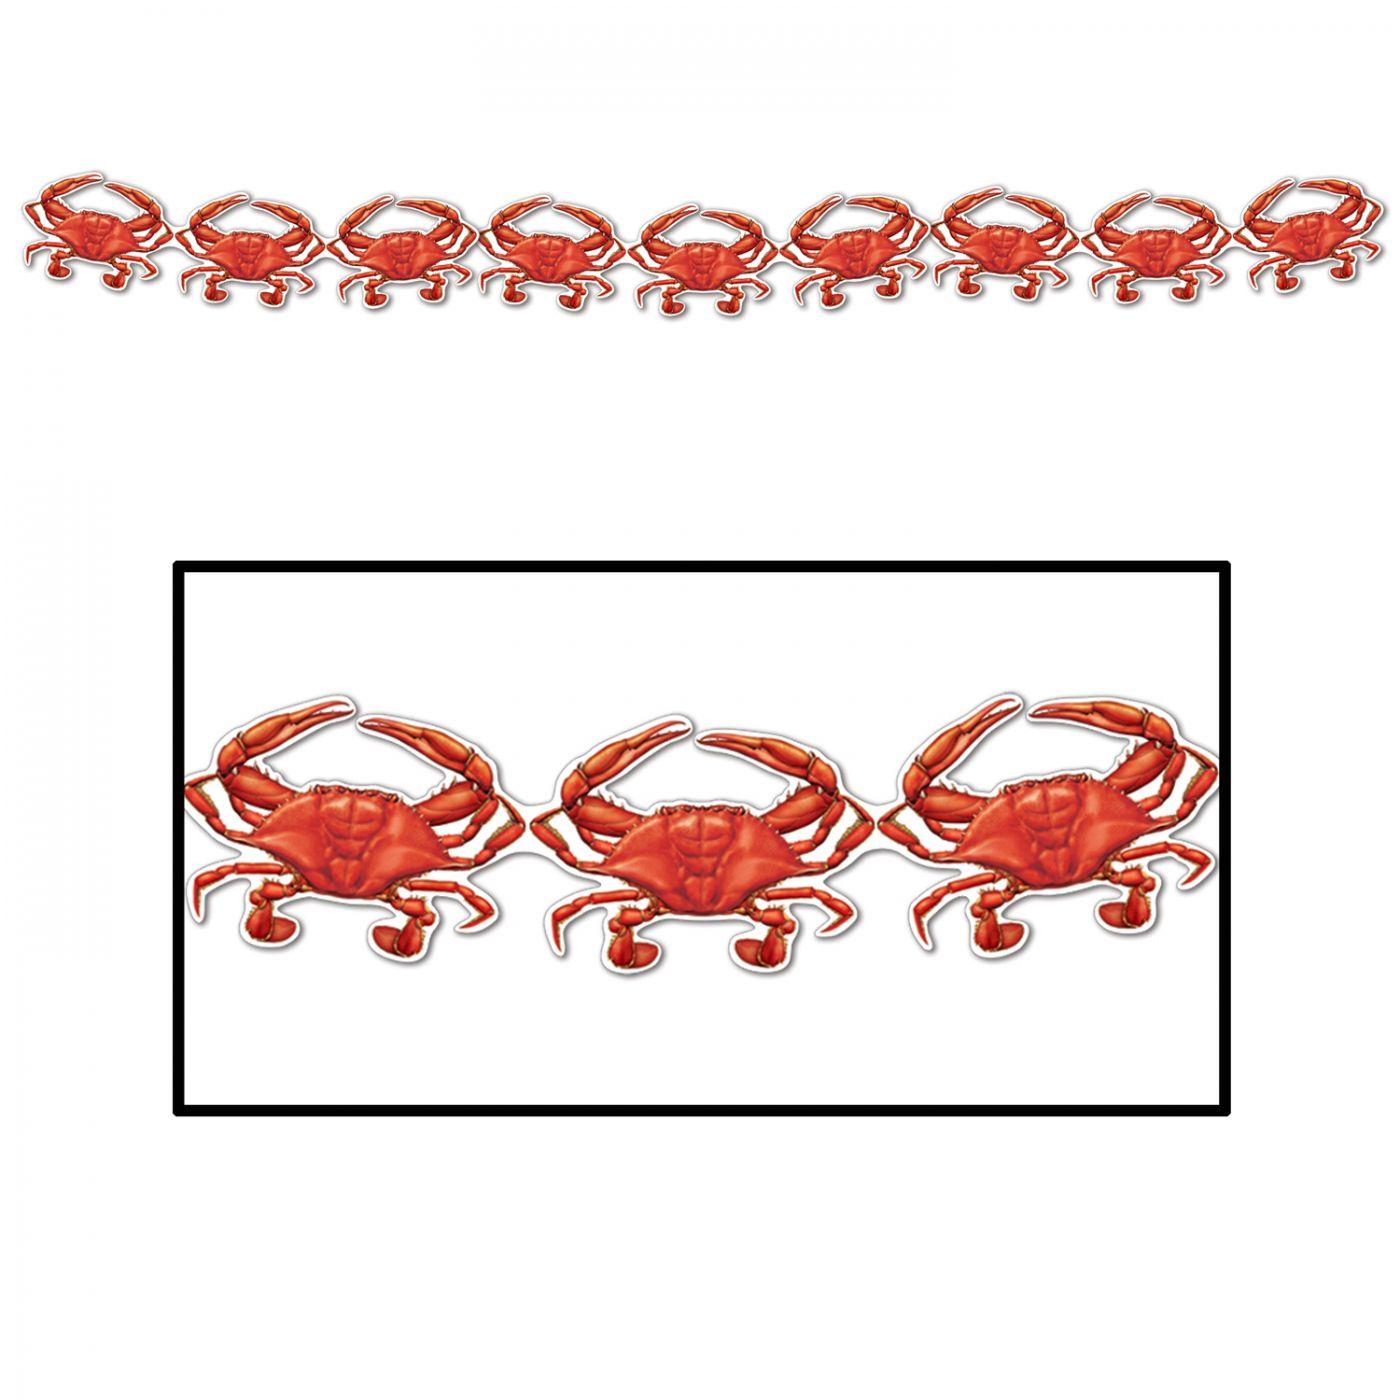 Crab Streamer image